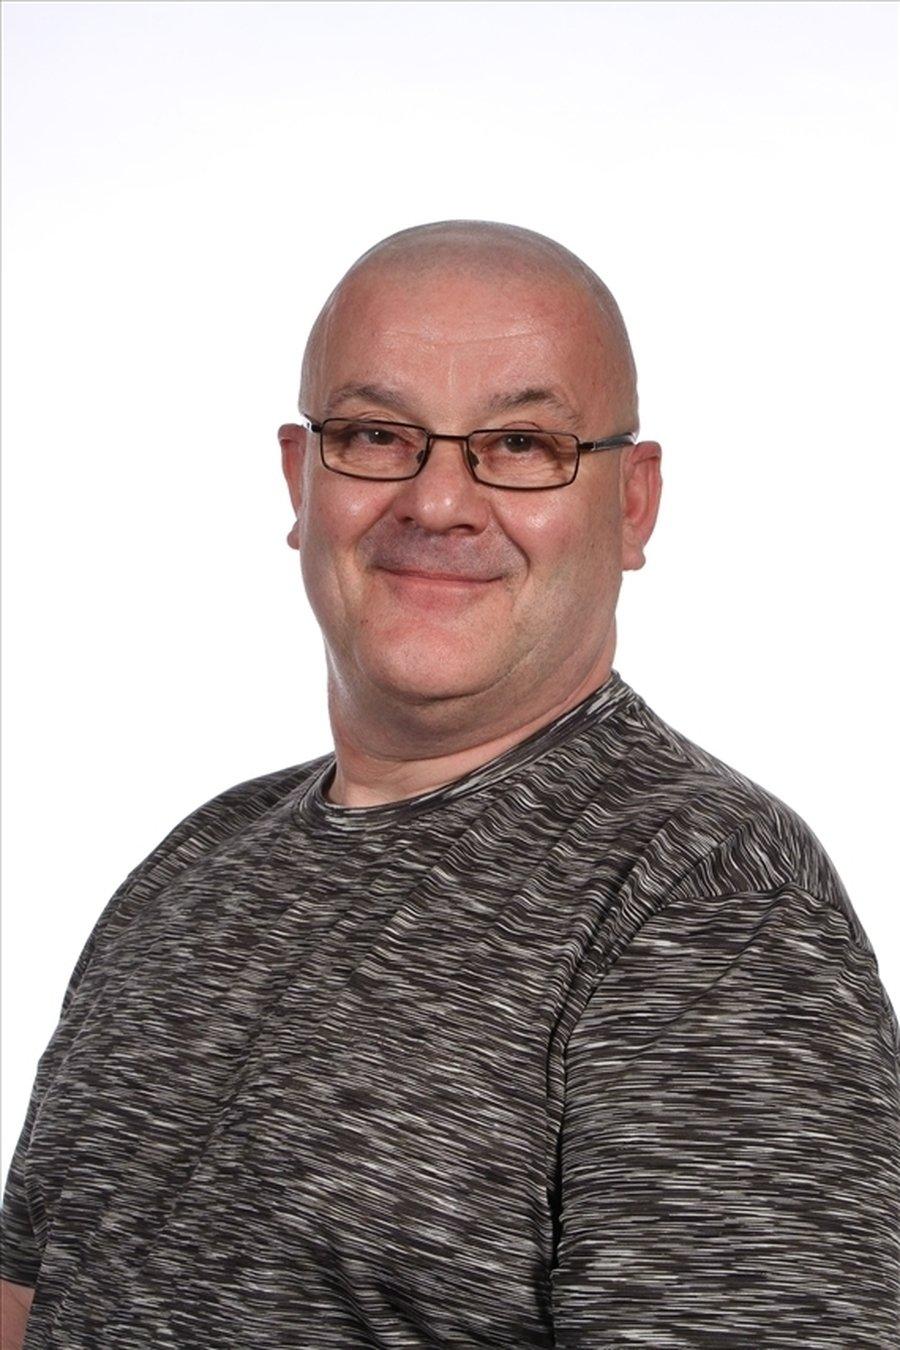 Mr Wray, Premises Manager